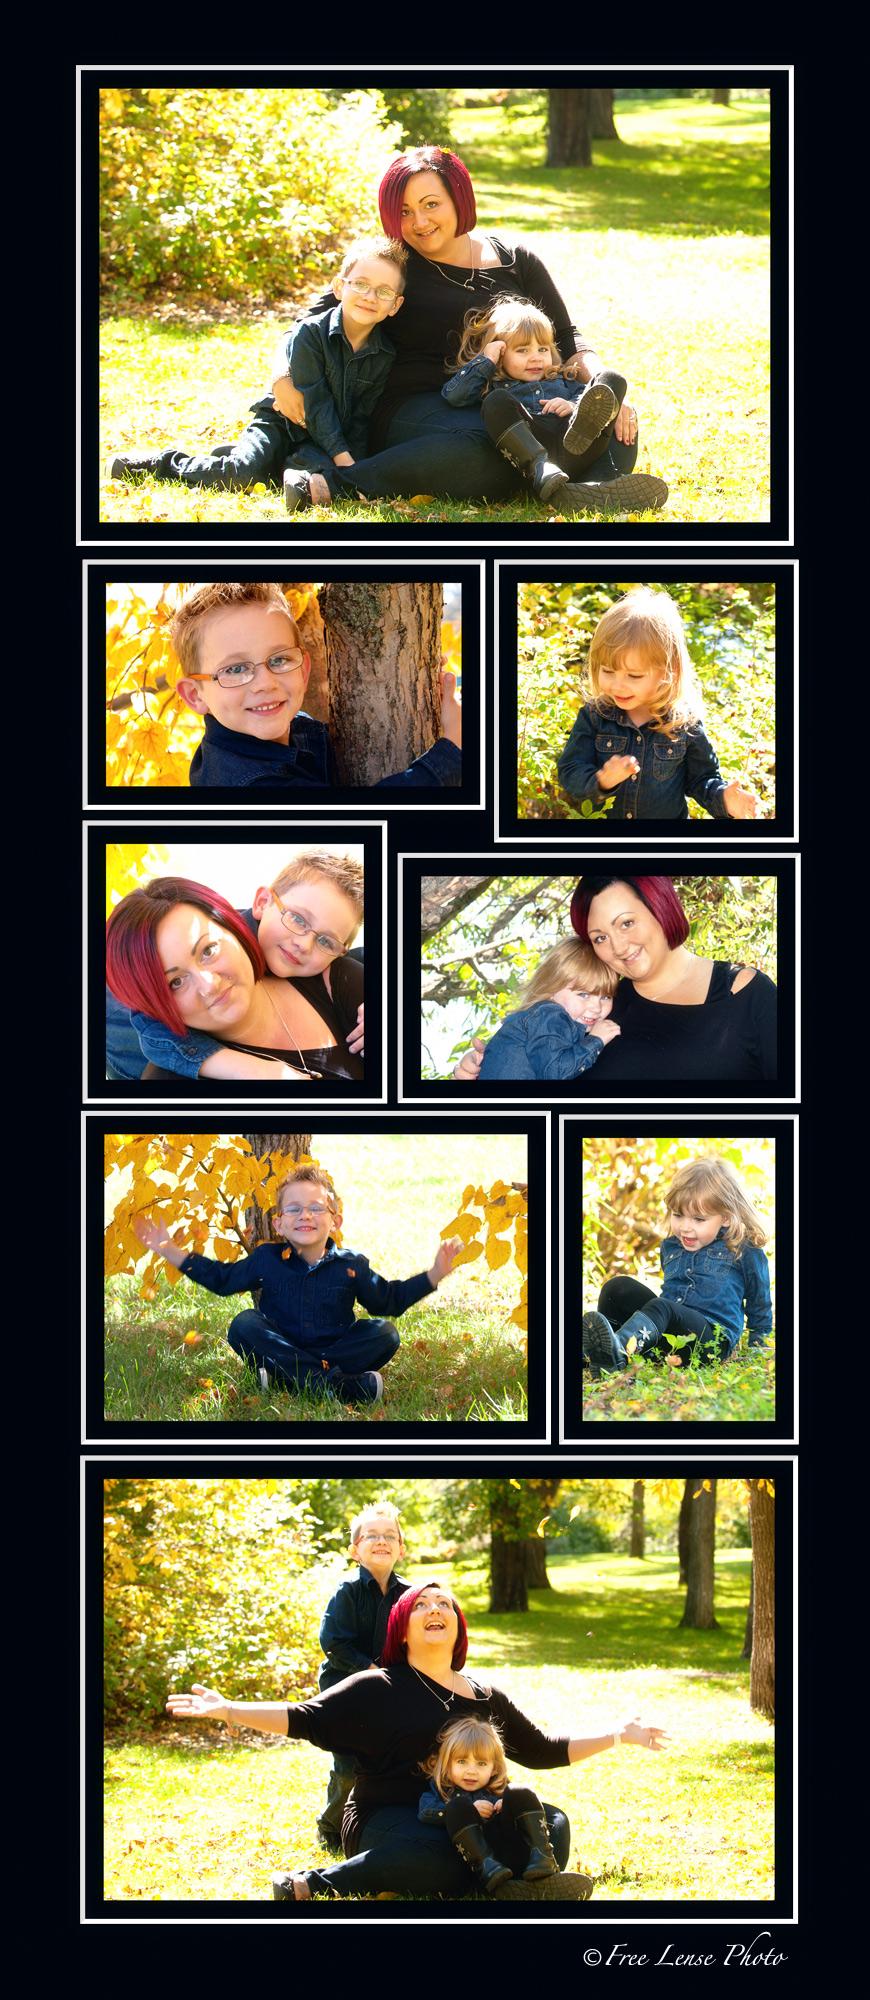 fall-photo-sessions-free-lense-photo.jpg